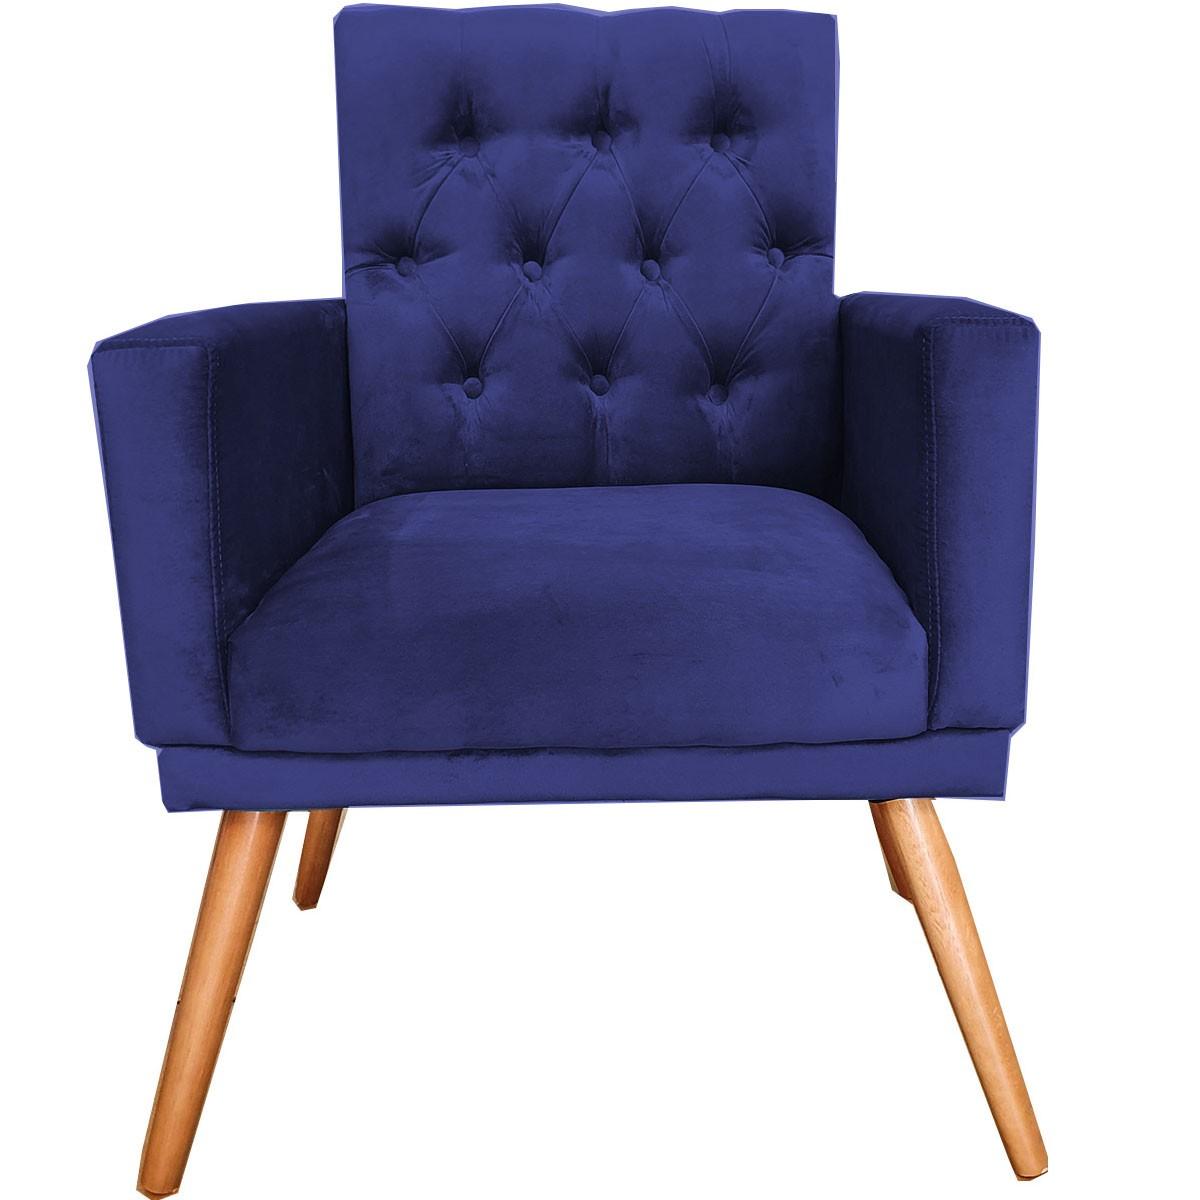 Poltrona Decorativa Alana Capitone Pé Palito Azul Marinho